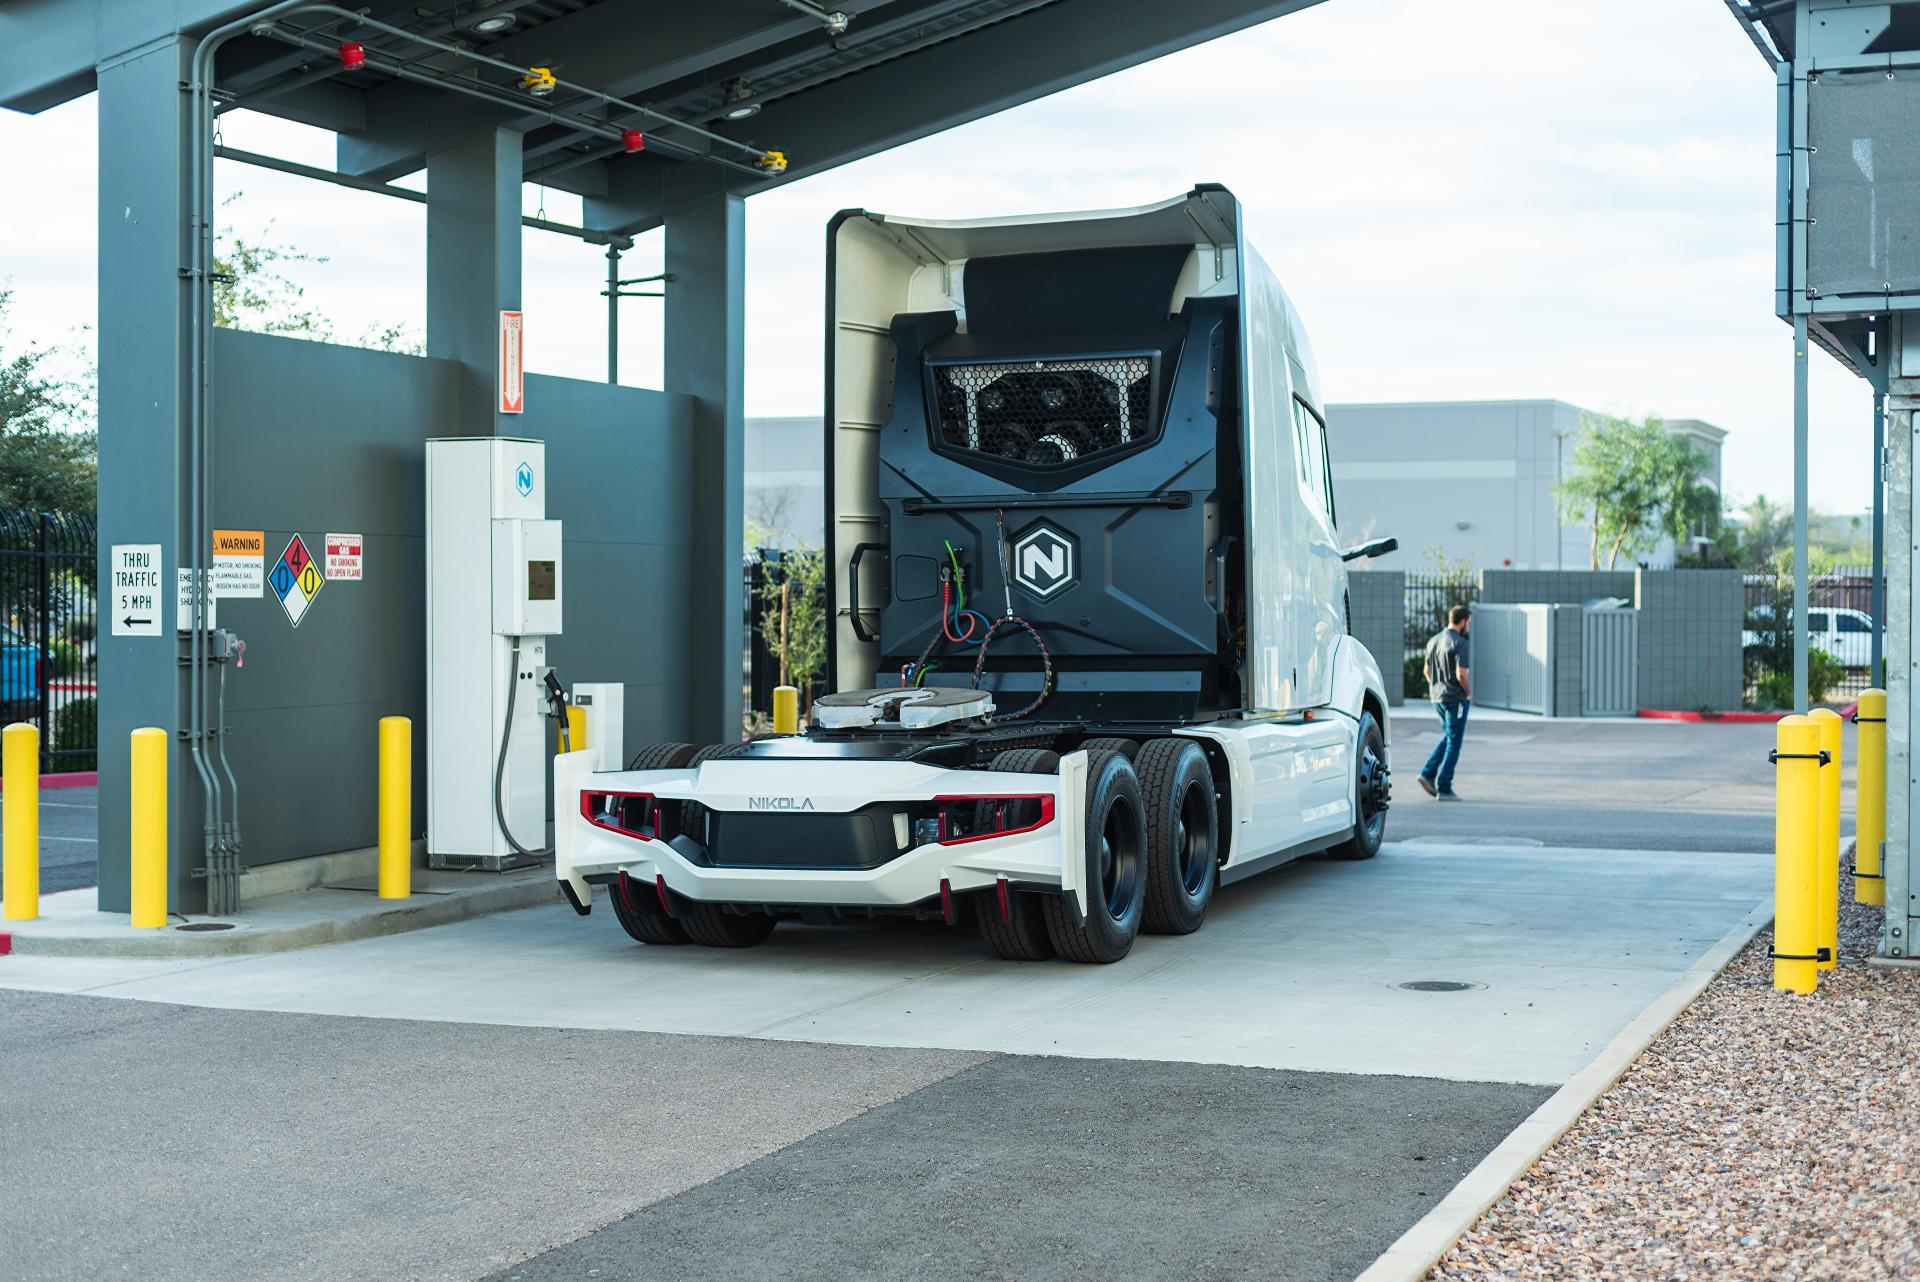 Nikola Motors produziert künftig über 40.000 kg Wasserstoff pro Tag